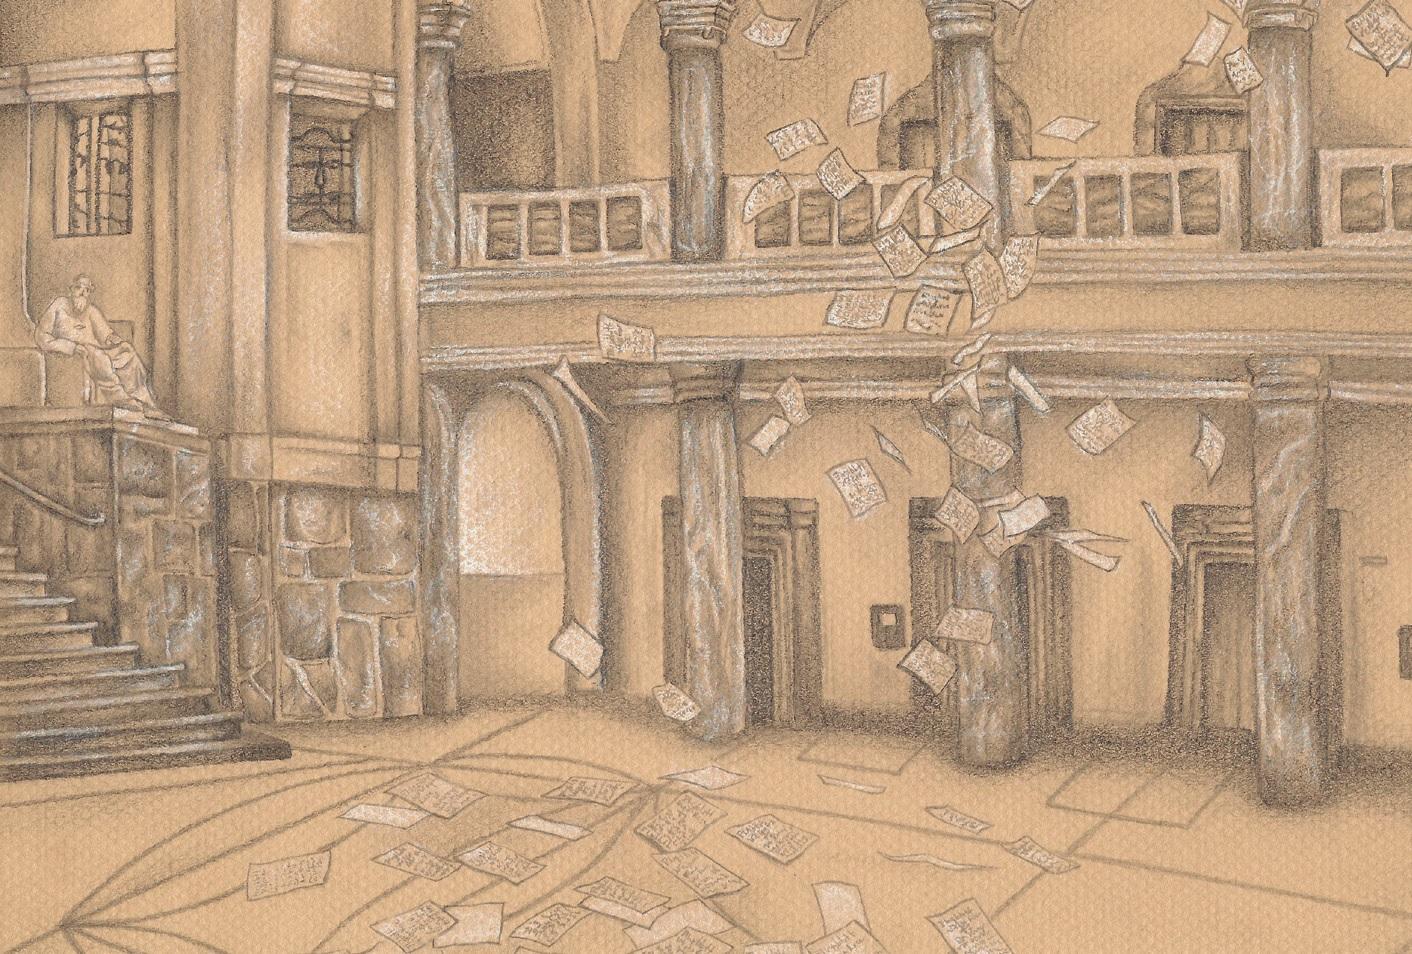 zeichnung2013-credit Yasmin Cobaiachi Utida